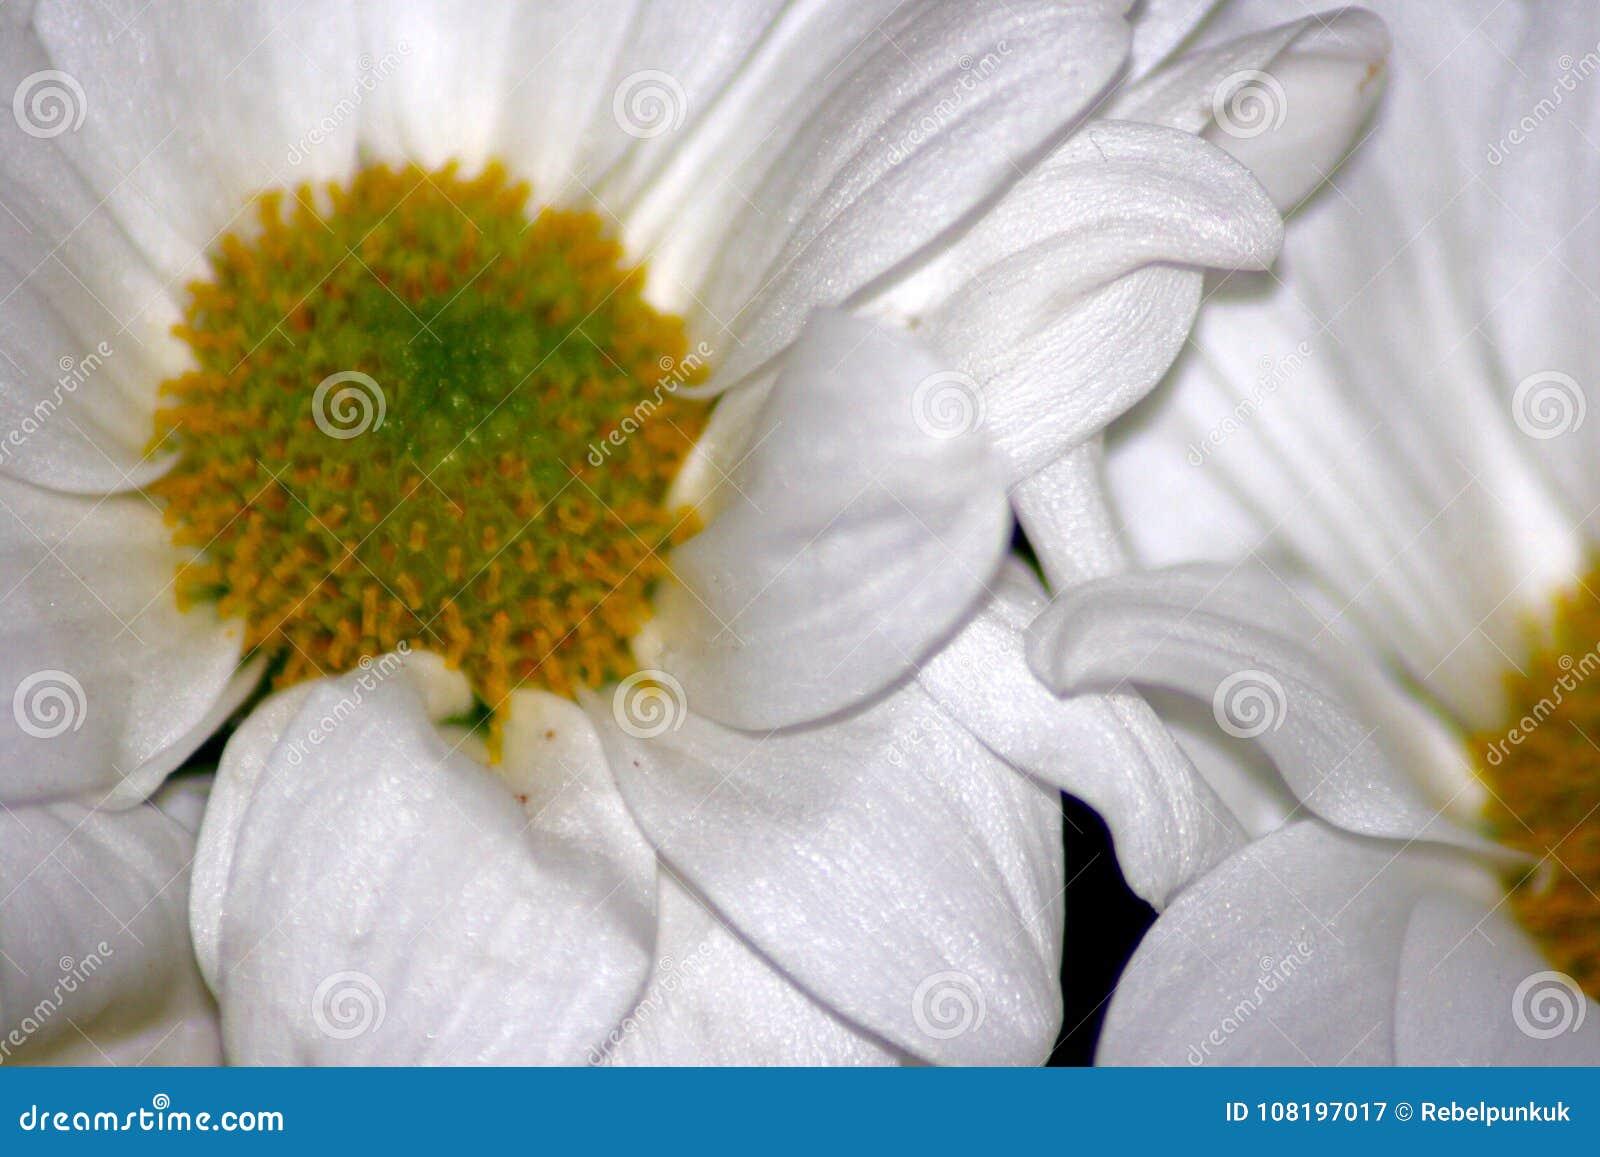 White Petalled Flower Stock Image Image Of White Daisy 108197017